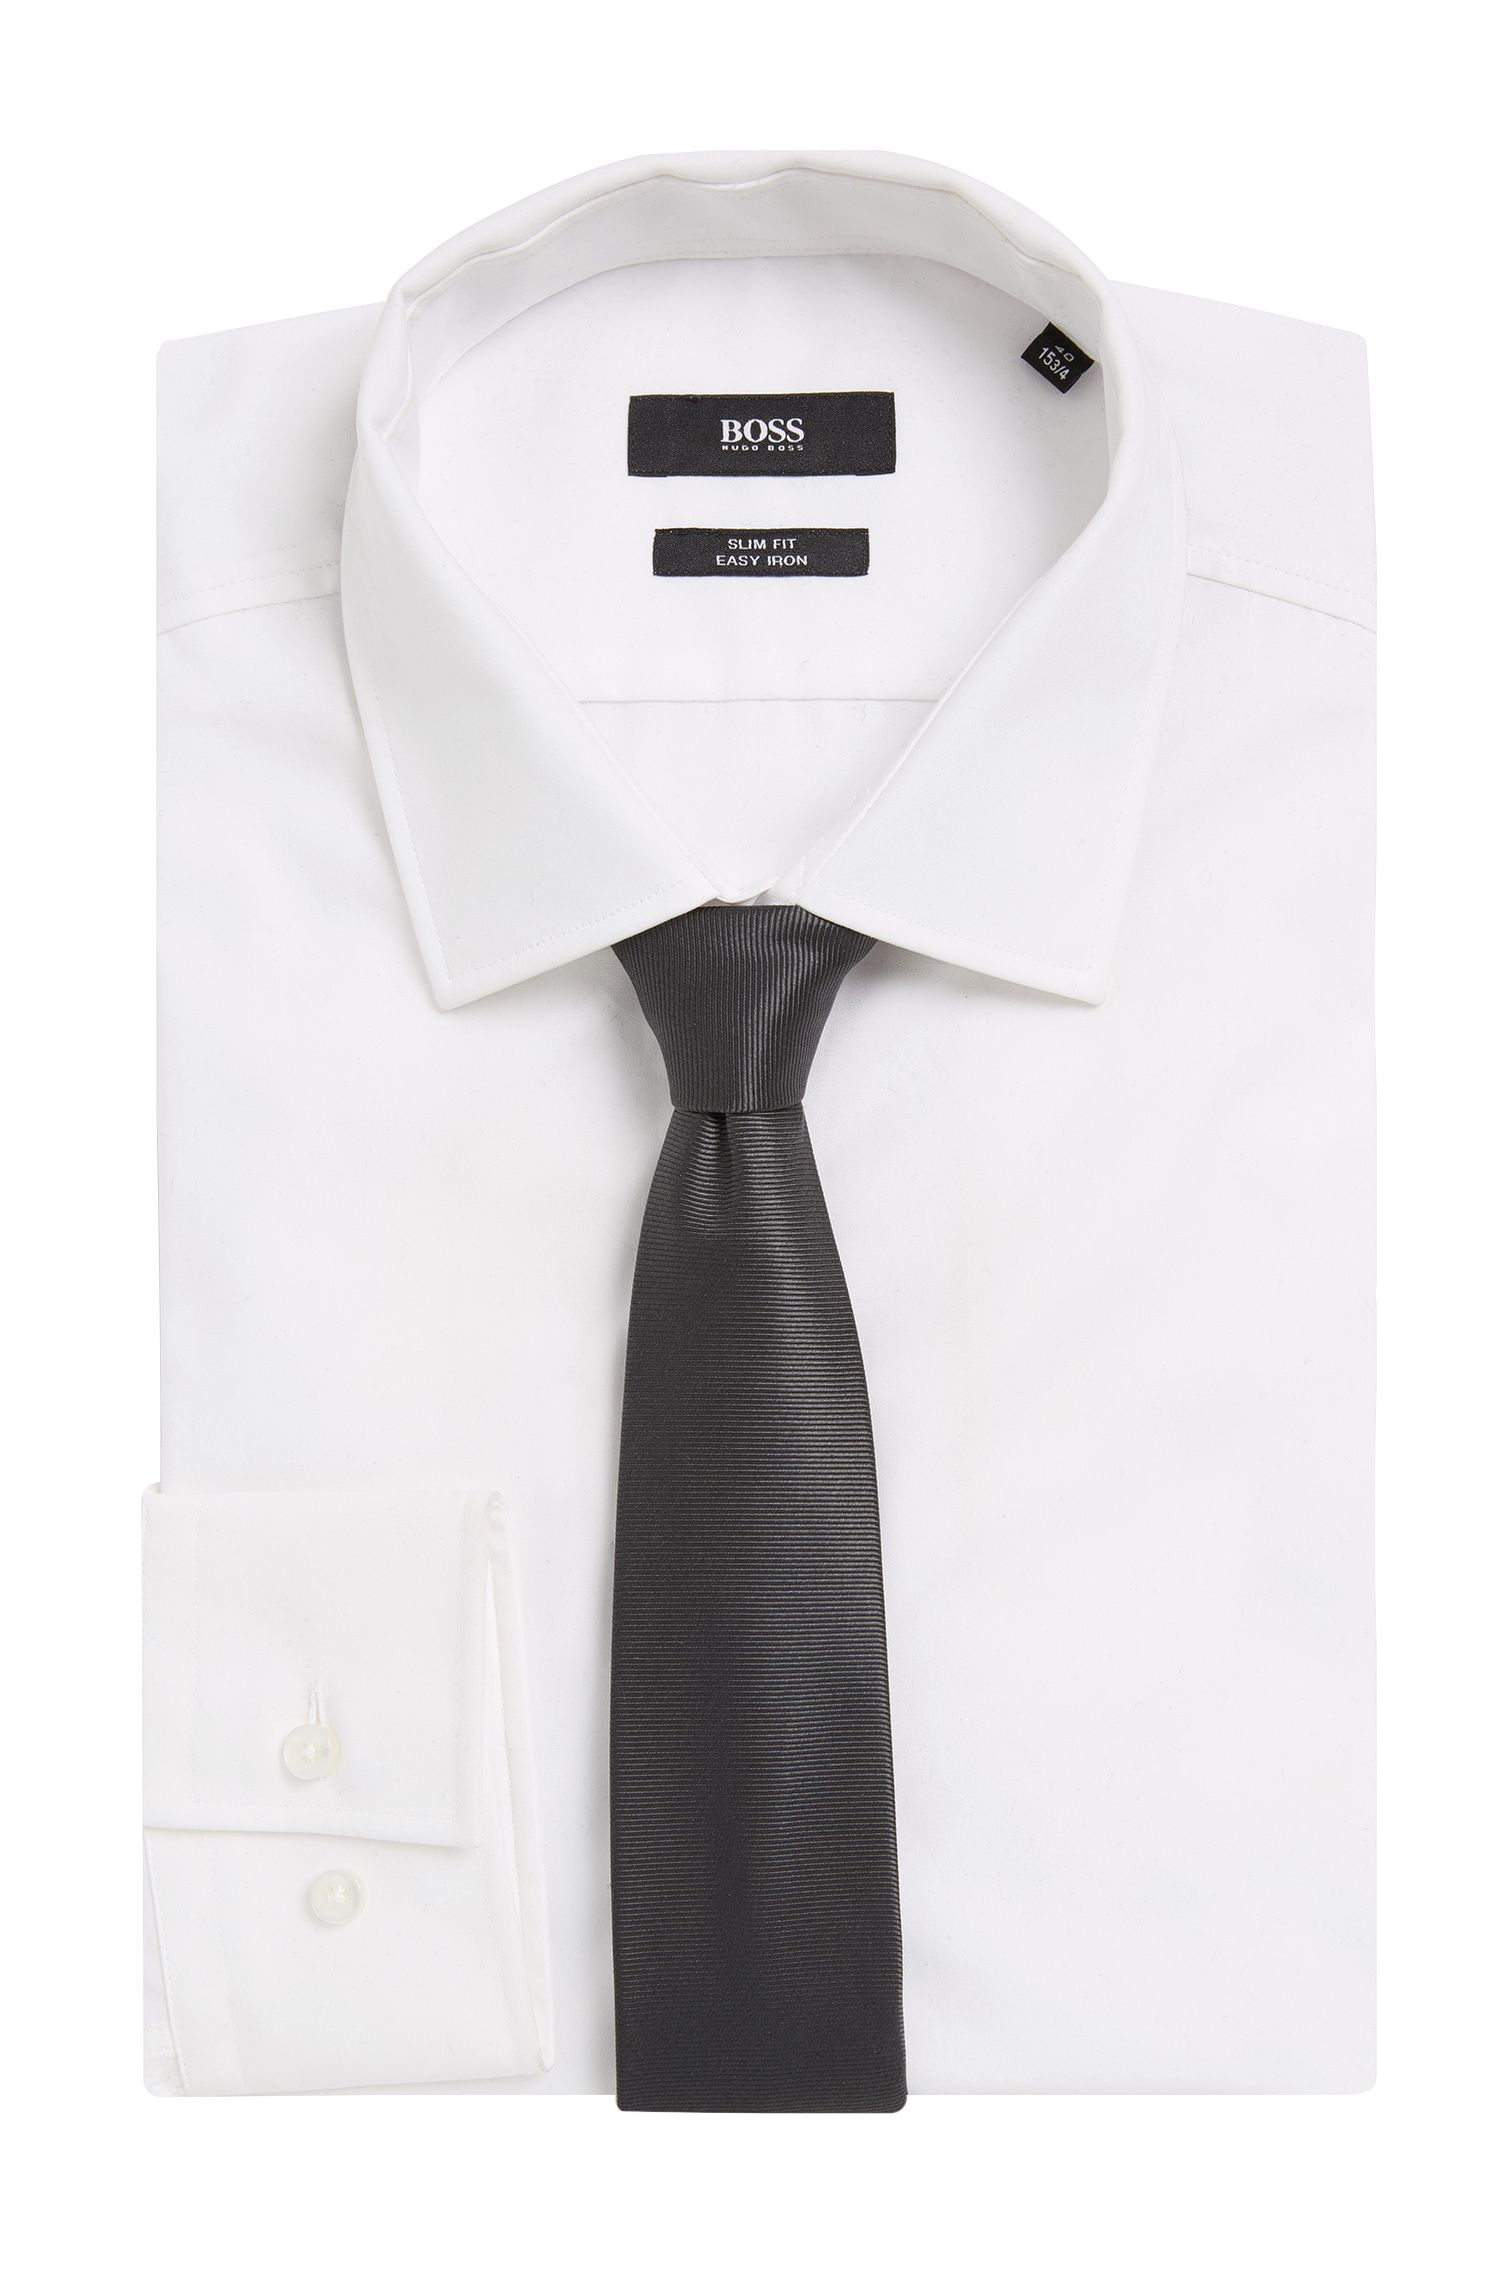 BOSS Tailored Italian Silk Slim Tie, Charcoal